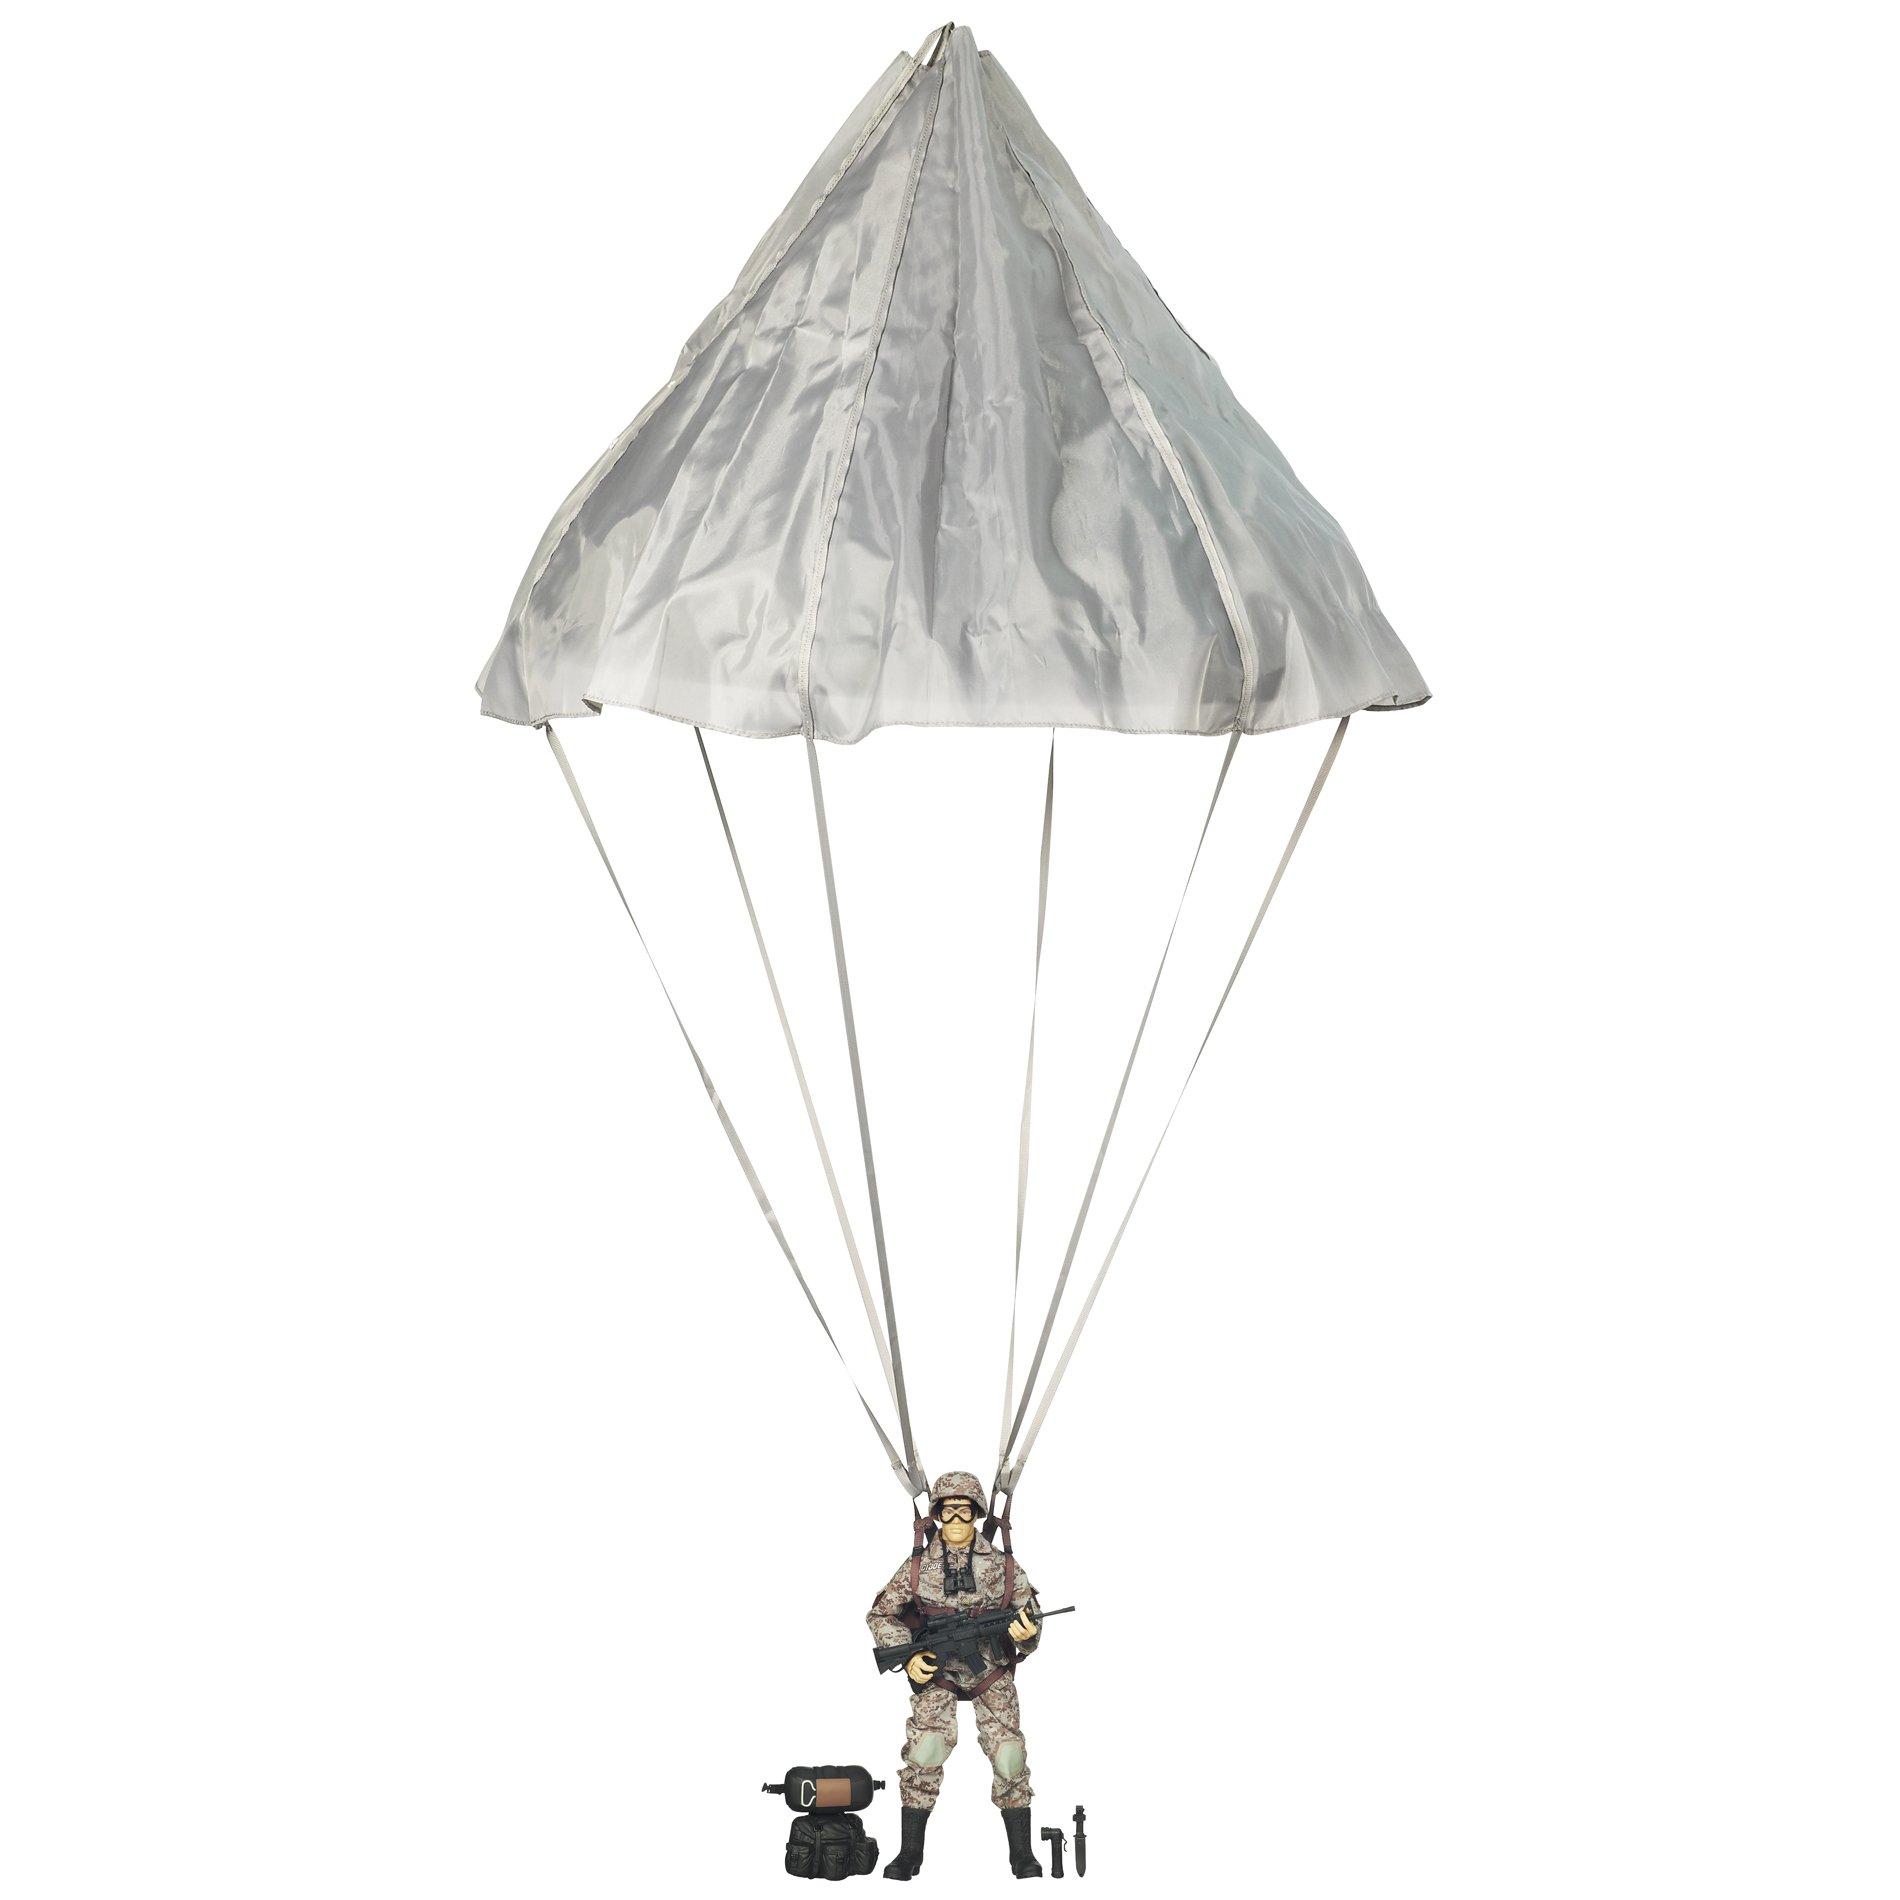 GI Joe Ultimate 12 Inch Army Paratrooper